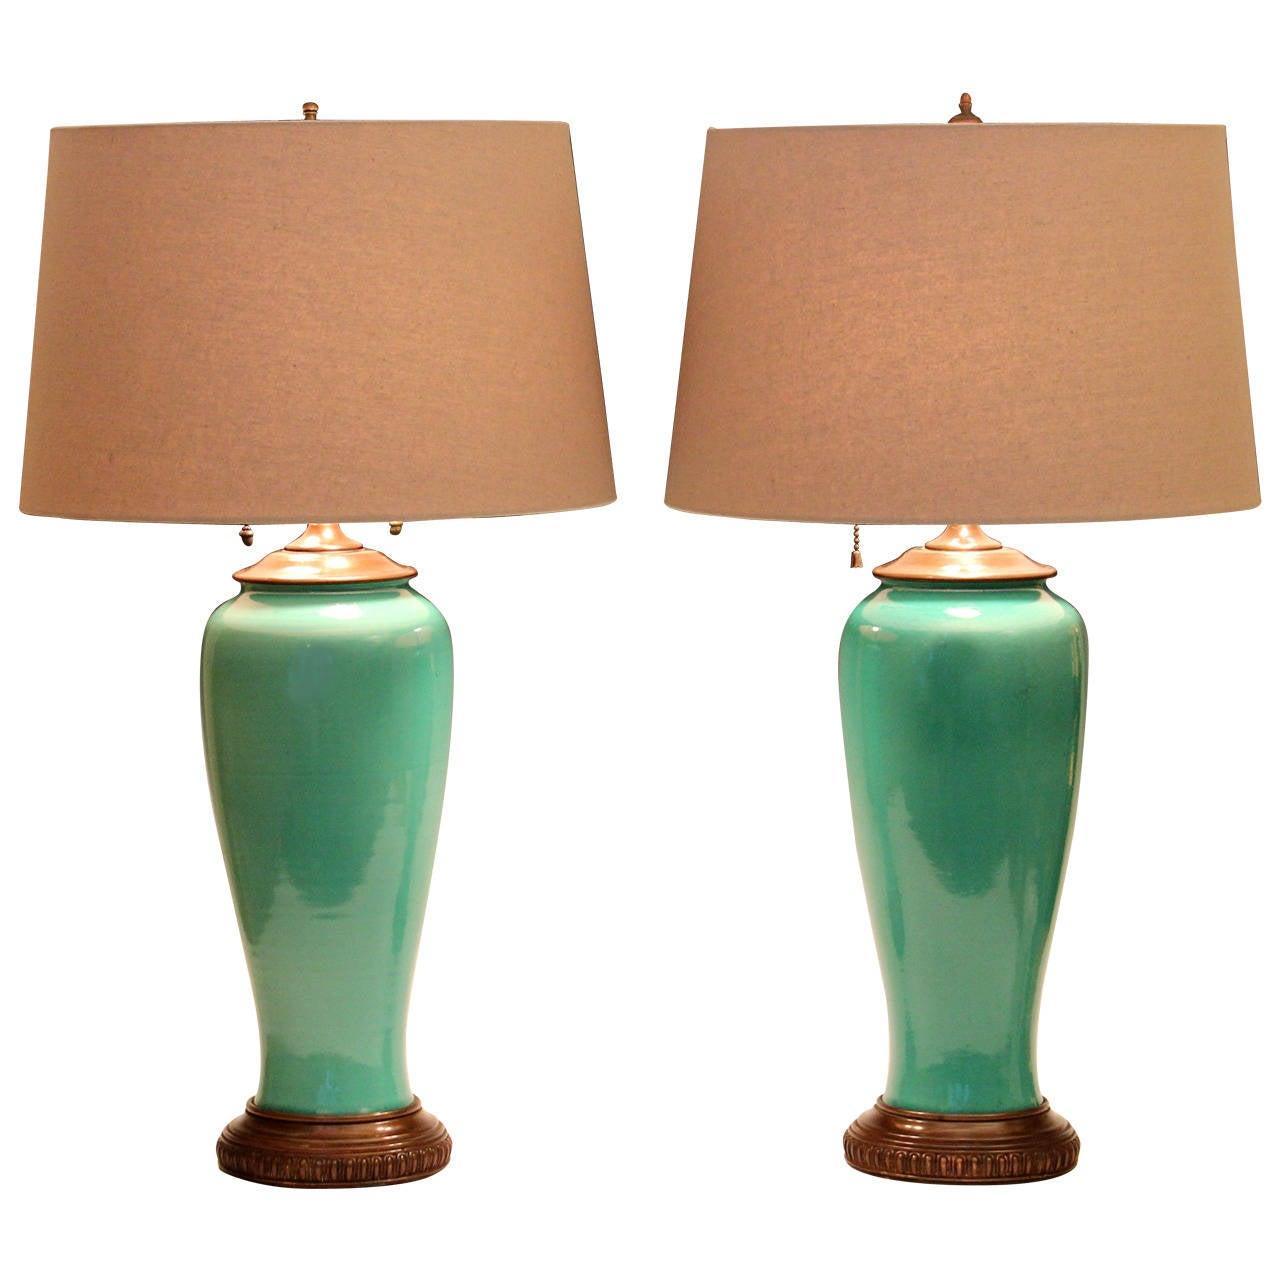 Pair of Vintage Rookwood Art Pottery Green Celadon Crackle Glaze Lamps at 1stdibs